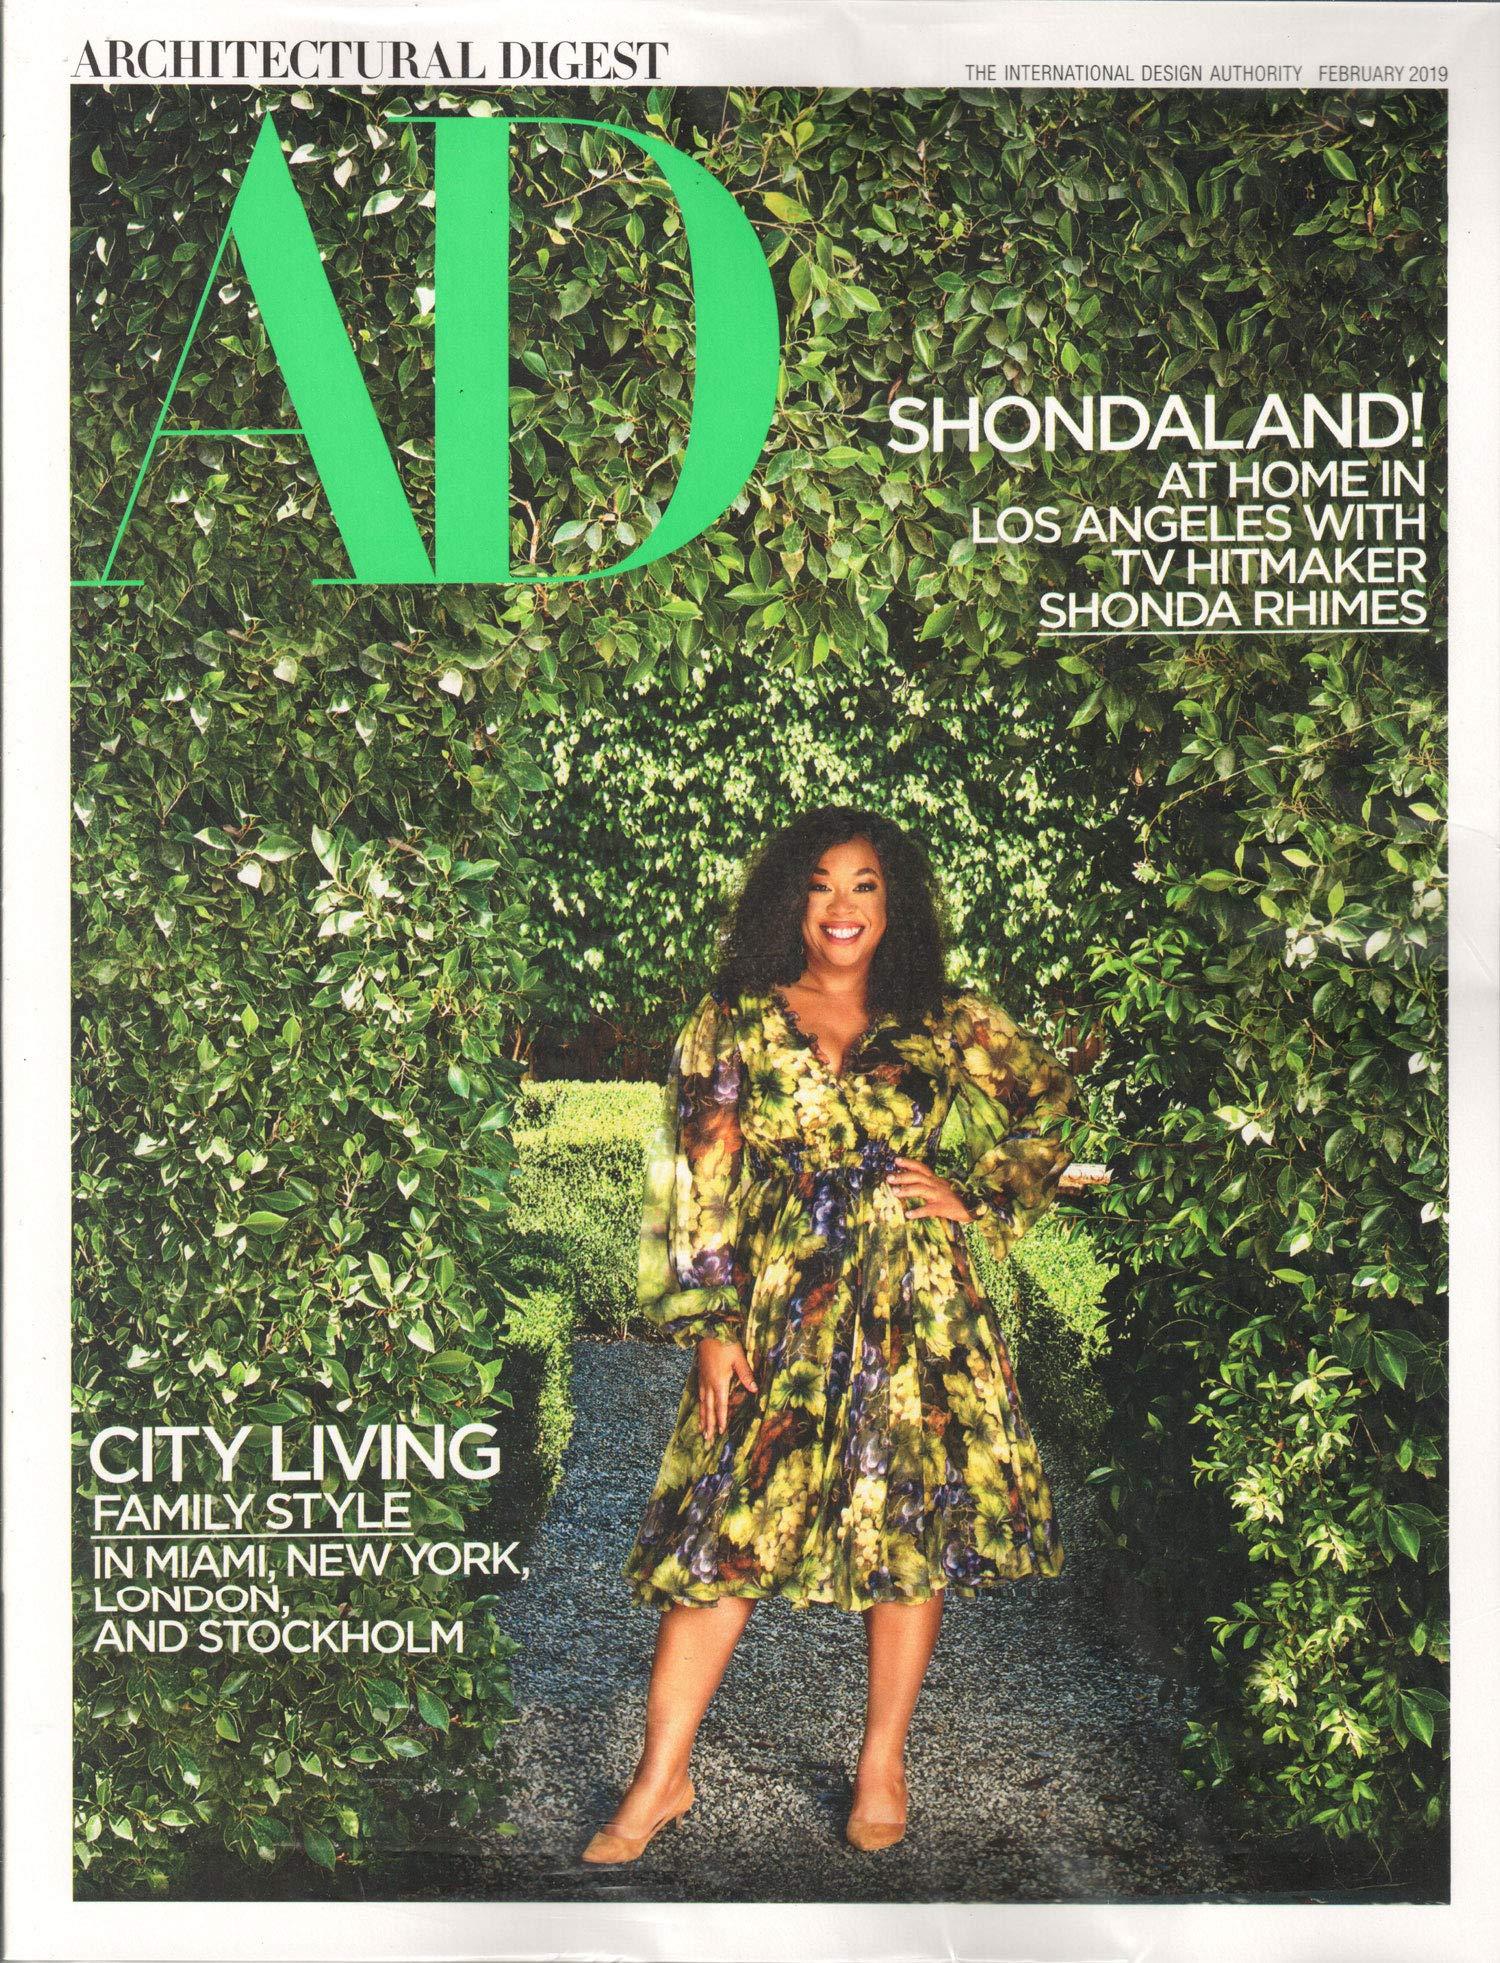 Architectural Digest Magazine February 2019 | Shonda Rhimes